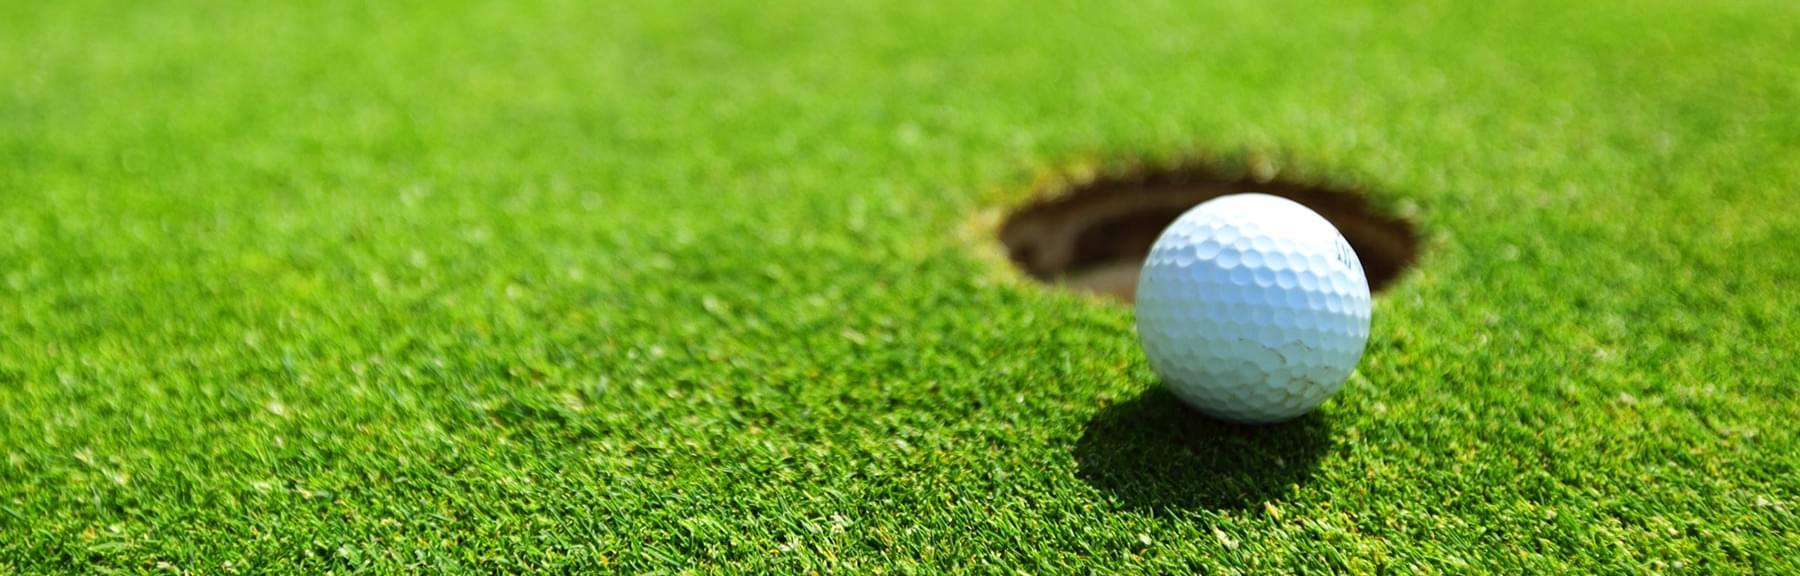 progettazione-campi-da-golf